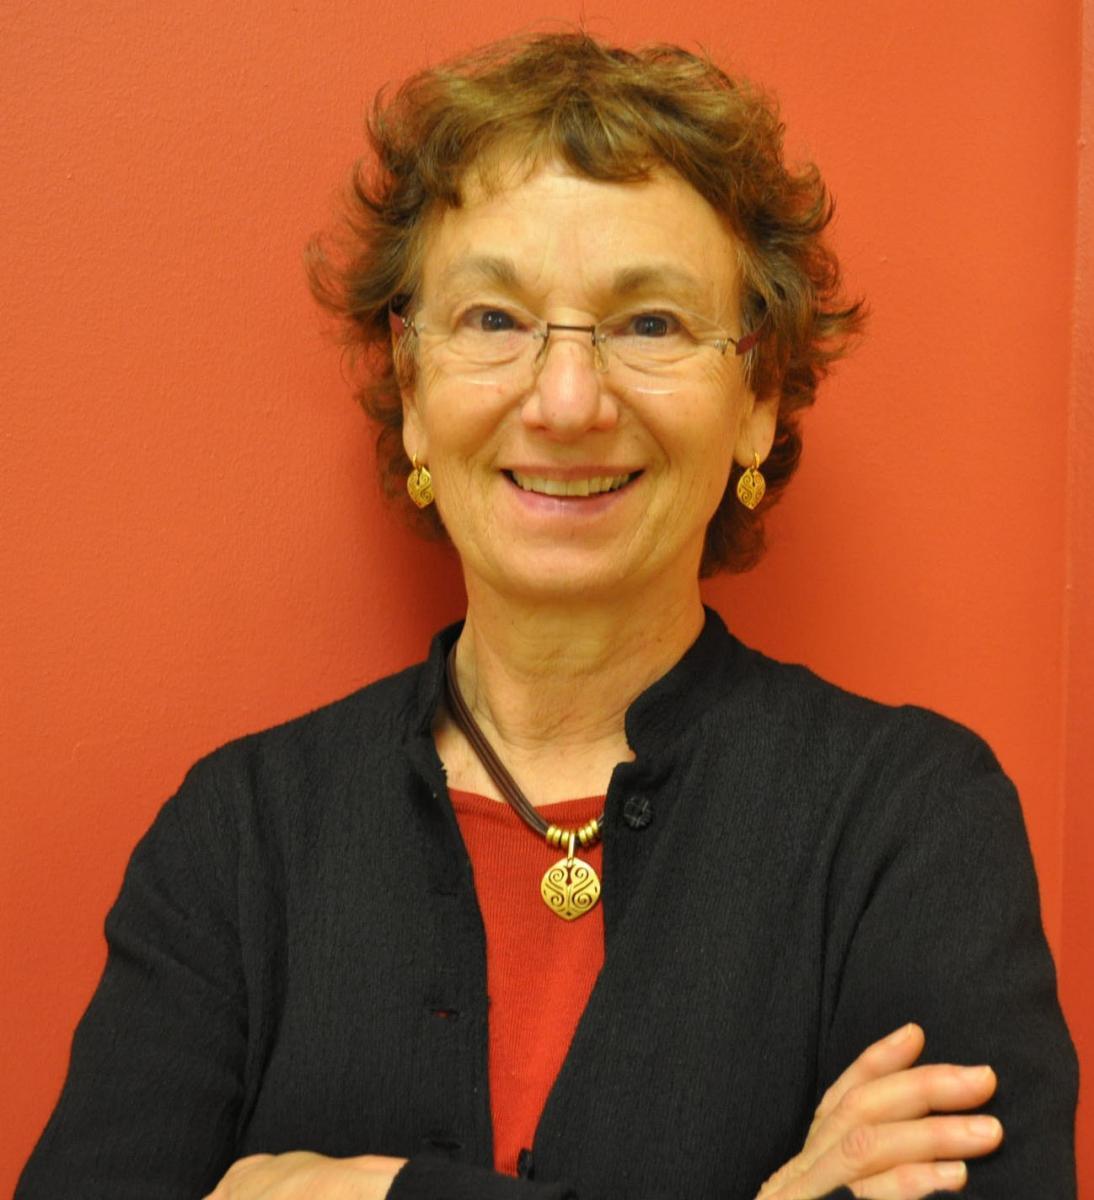 Kathy Gipps